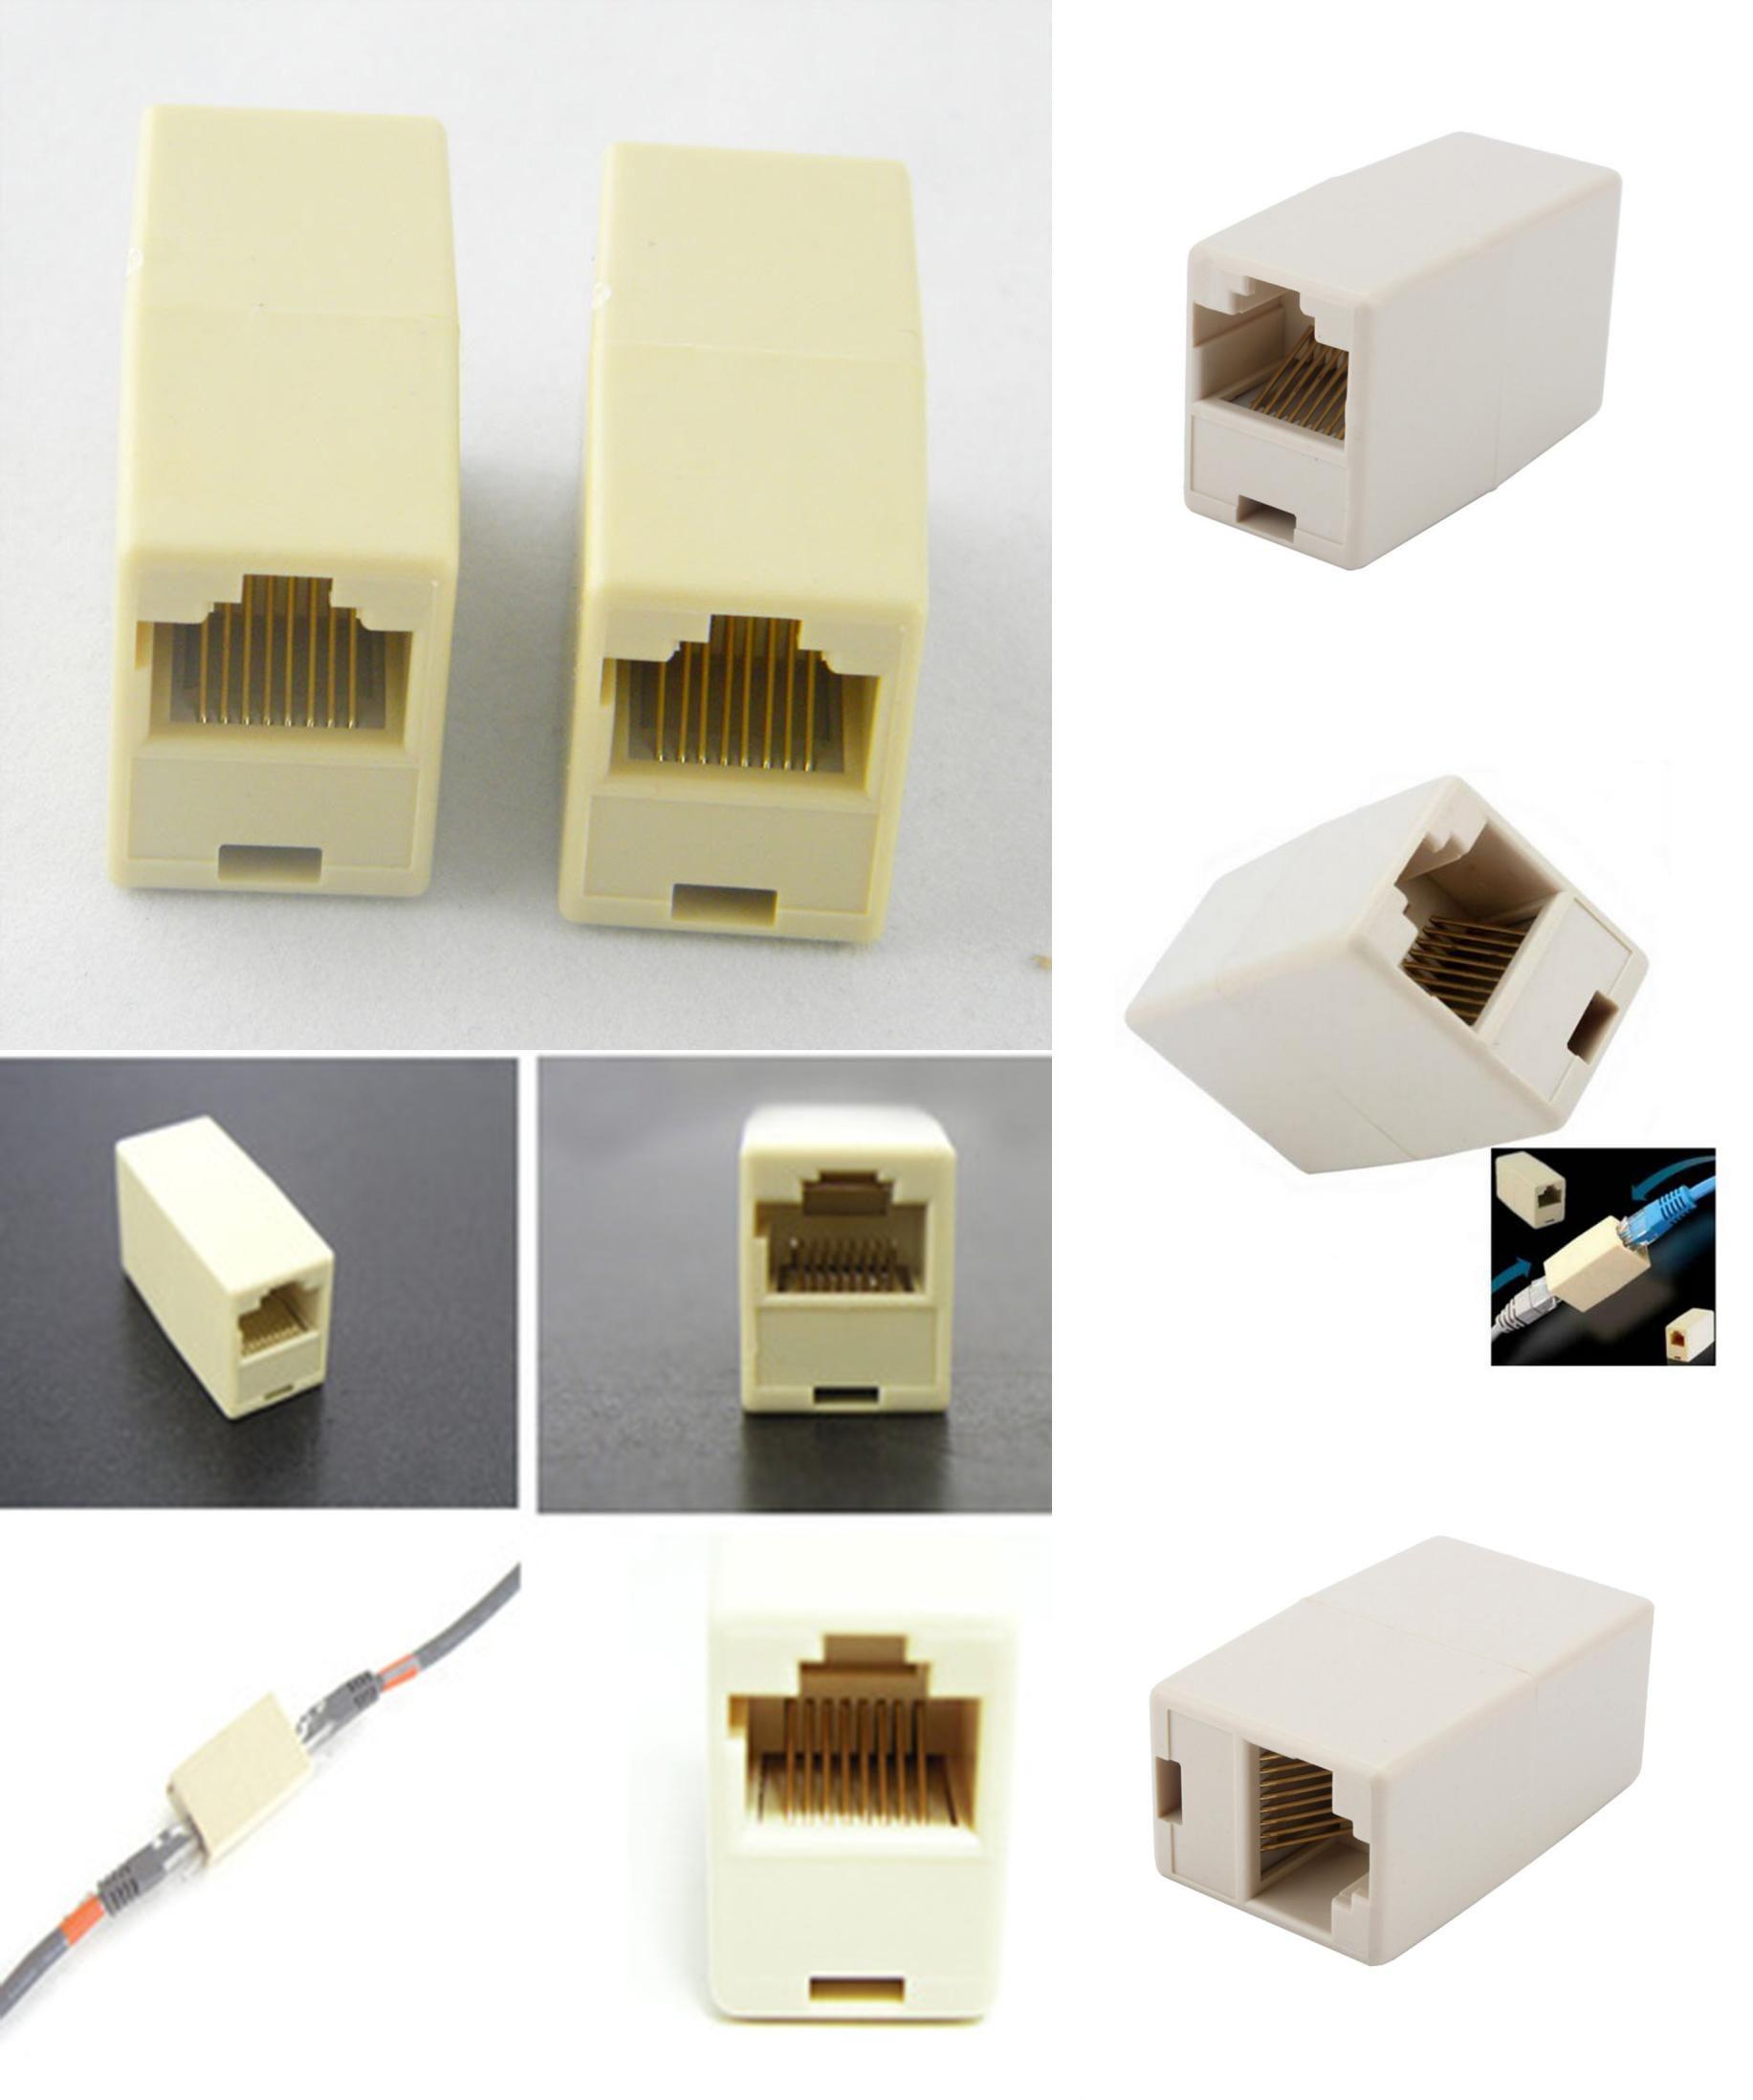 Visit To Buy Hot Selling Portable Cable Joiner Rj45 Adapter Network Ethernet Lan Coupler Connector Extender Plug Advertisem Usb Flash Drive Rj45 Flash Drive